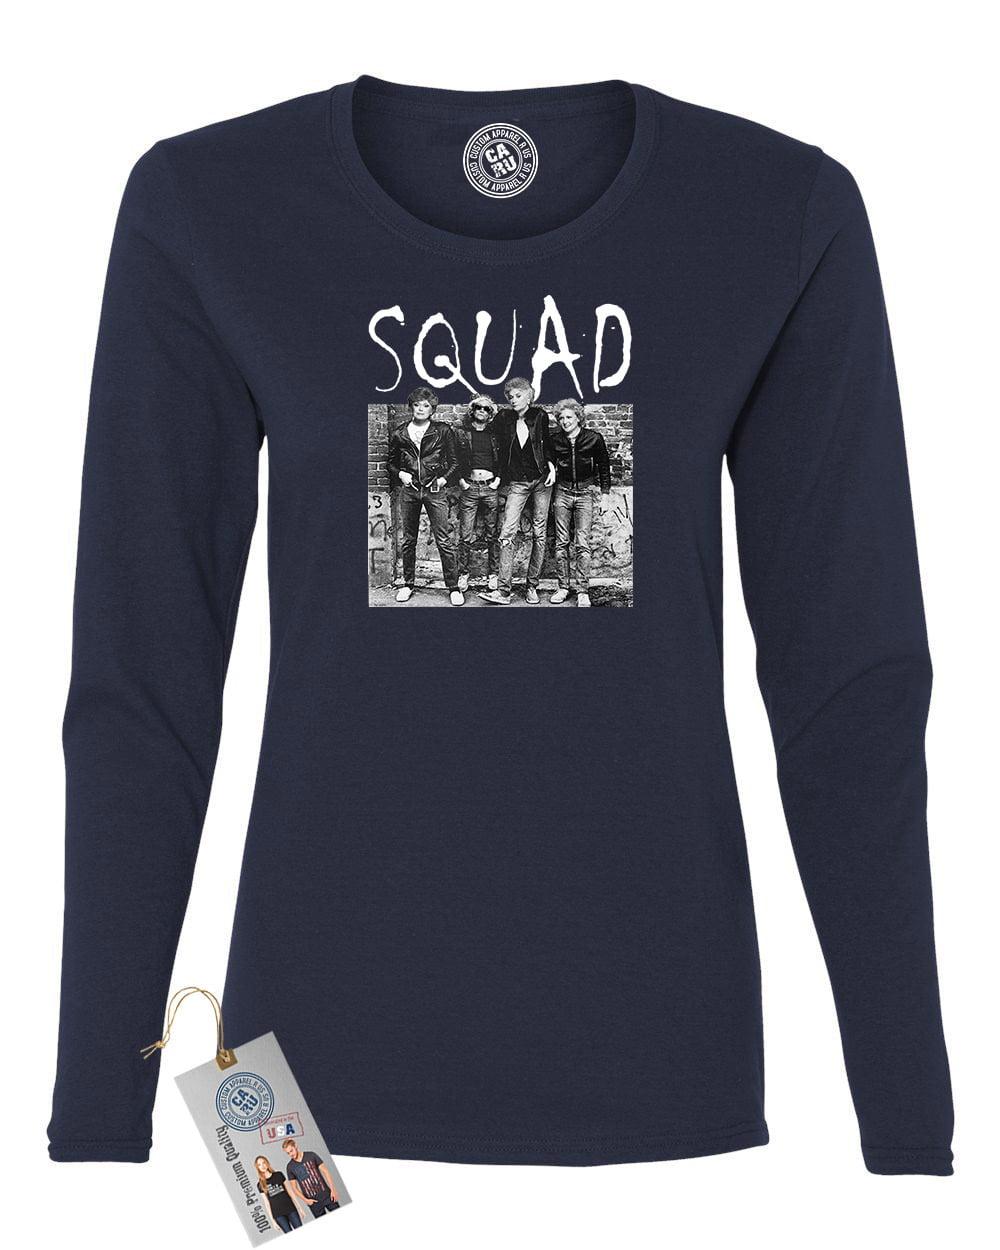 Golden Girls Squad Gang TV Show Womens Long Sleeve Shirt